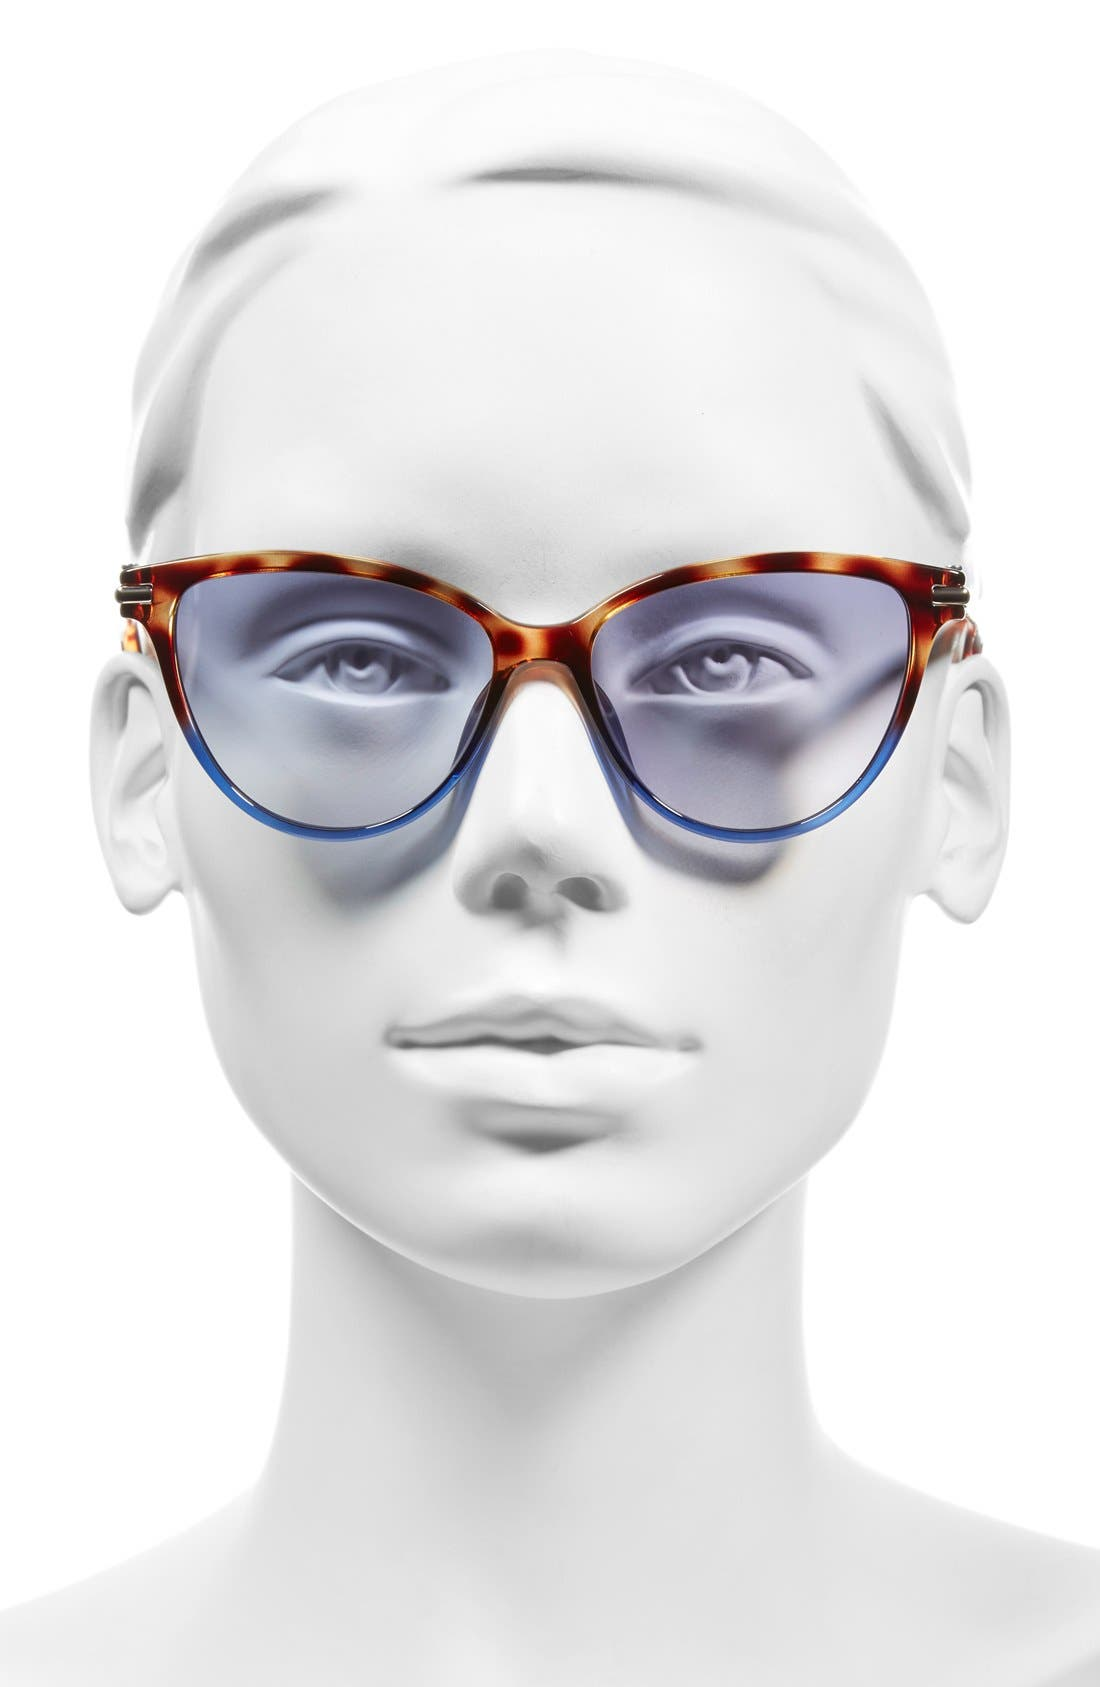 53mm Cat Eye Sunglasses,                             Alternate thumbnail 2, color,                             Havanabrownblue